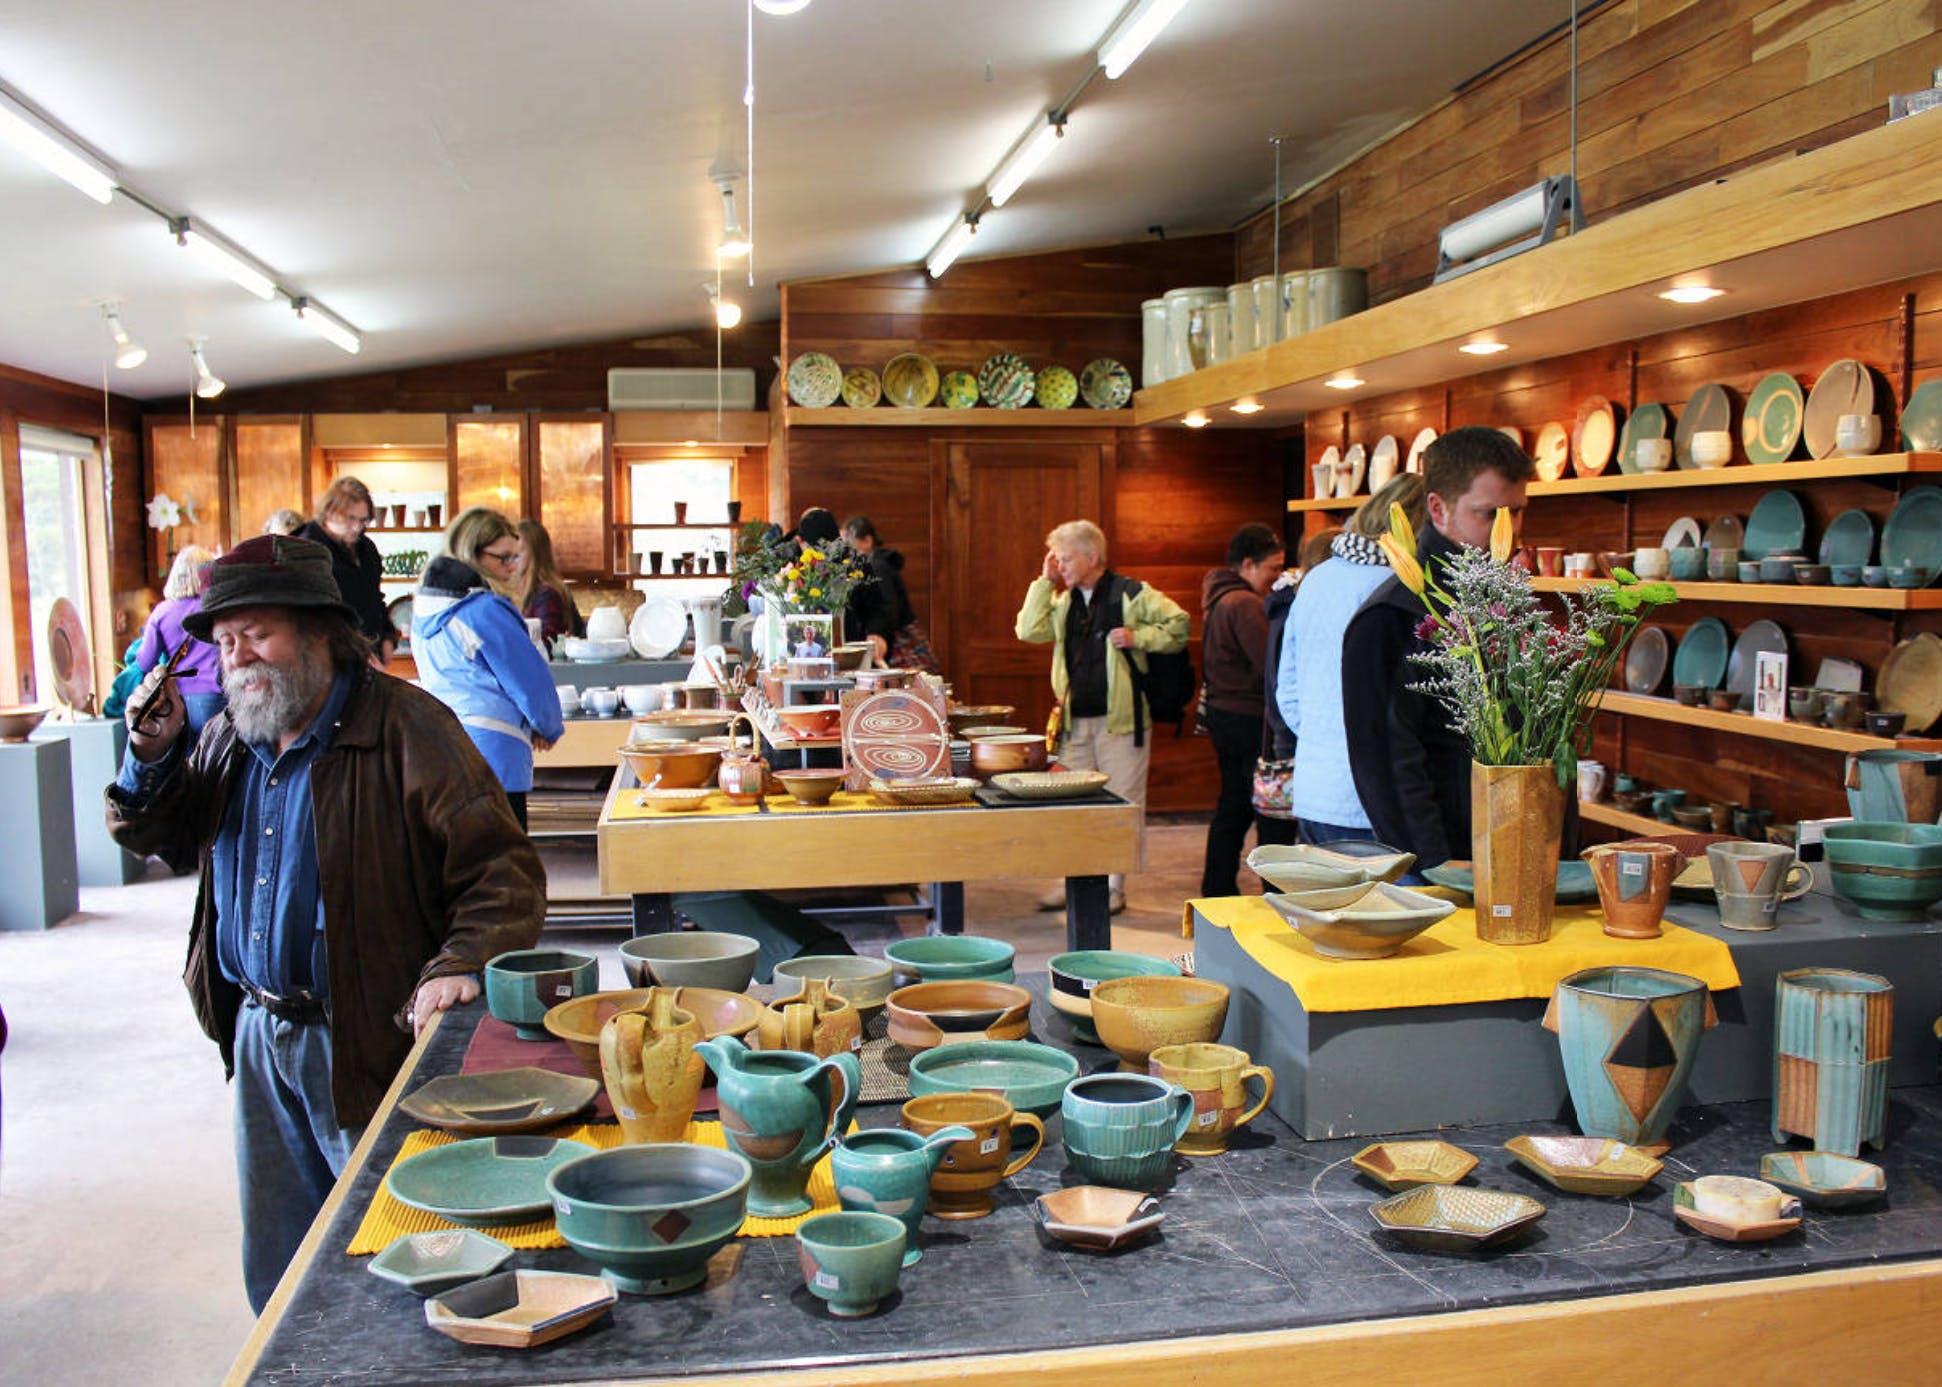 Jeff Oestreich studio St Croix Valley Pottery Tour 2014